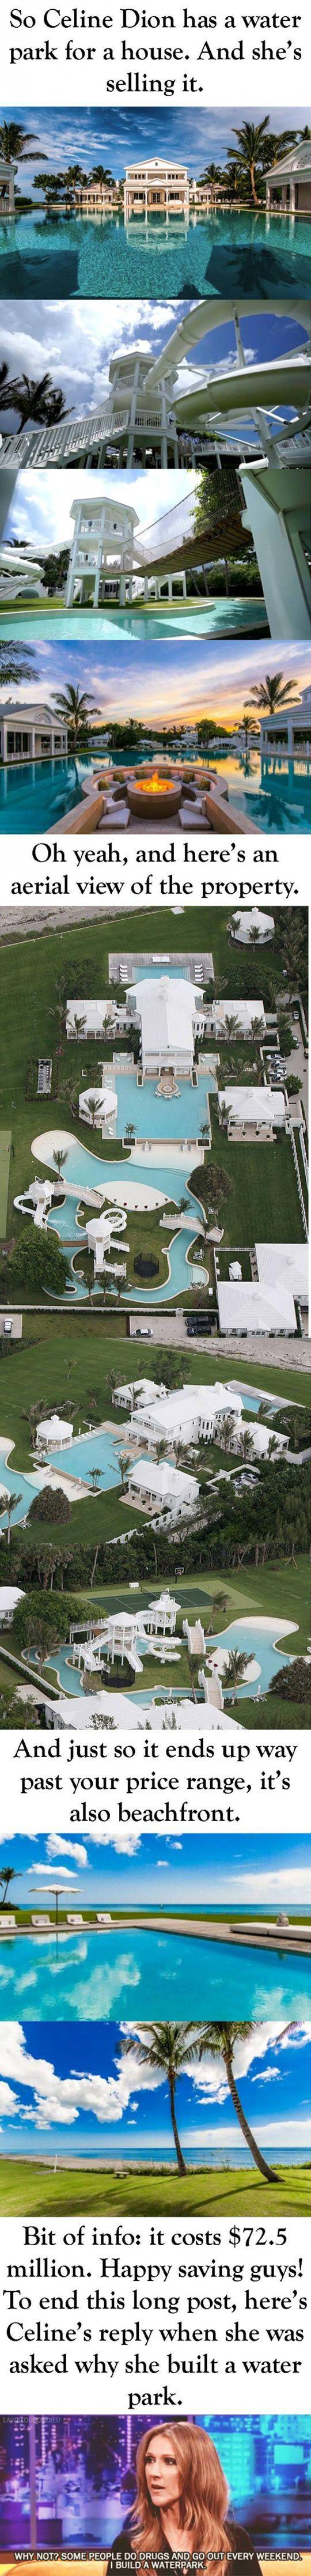 Celine Dion's Water park...